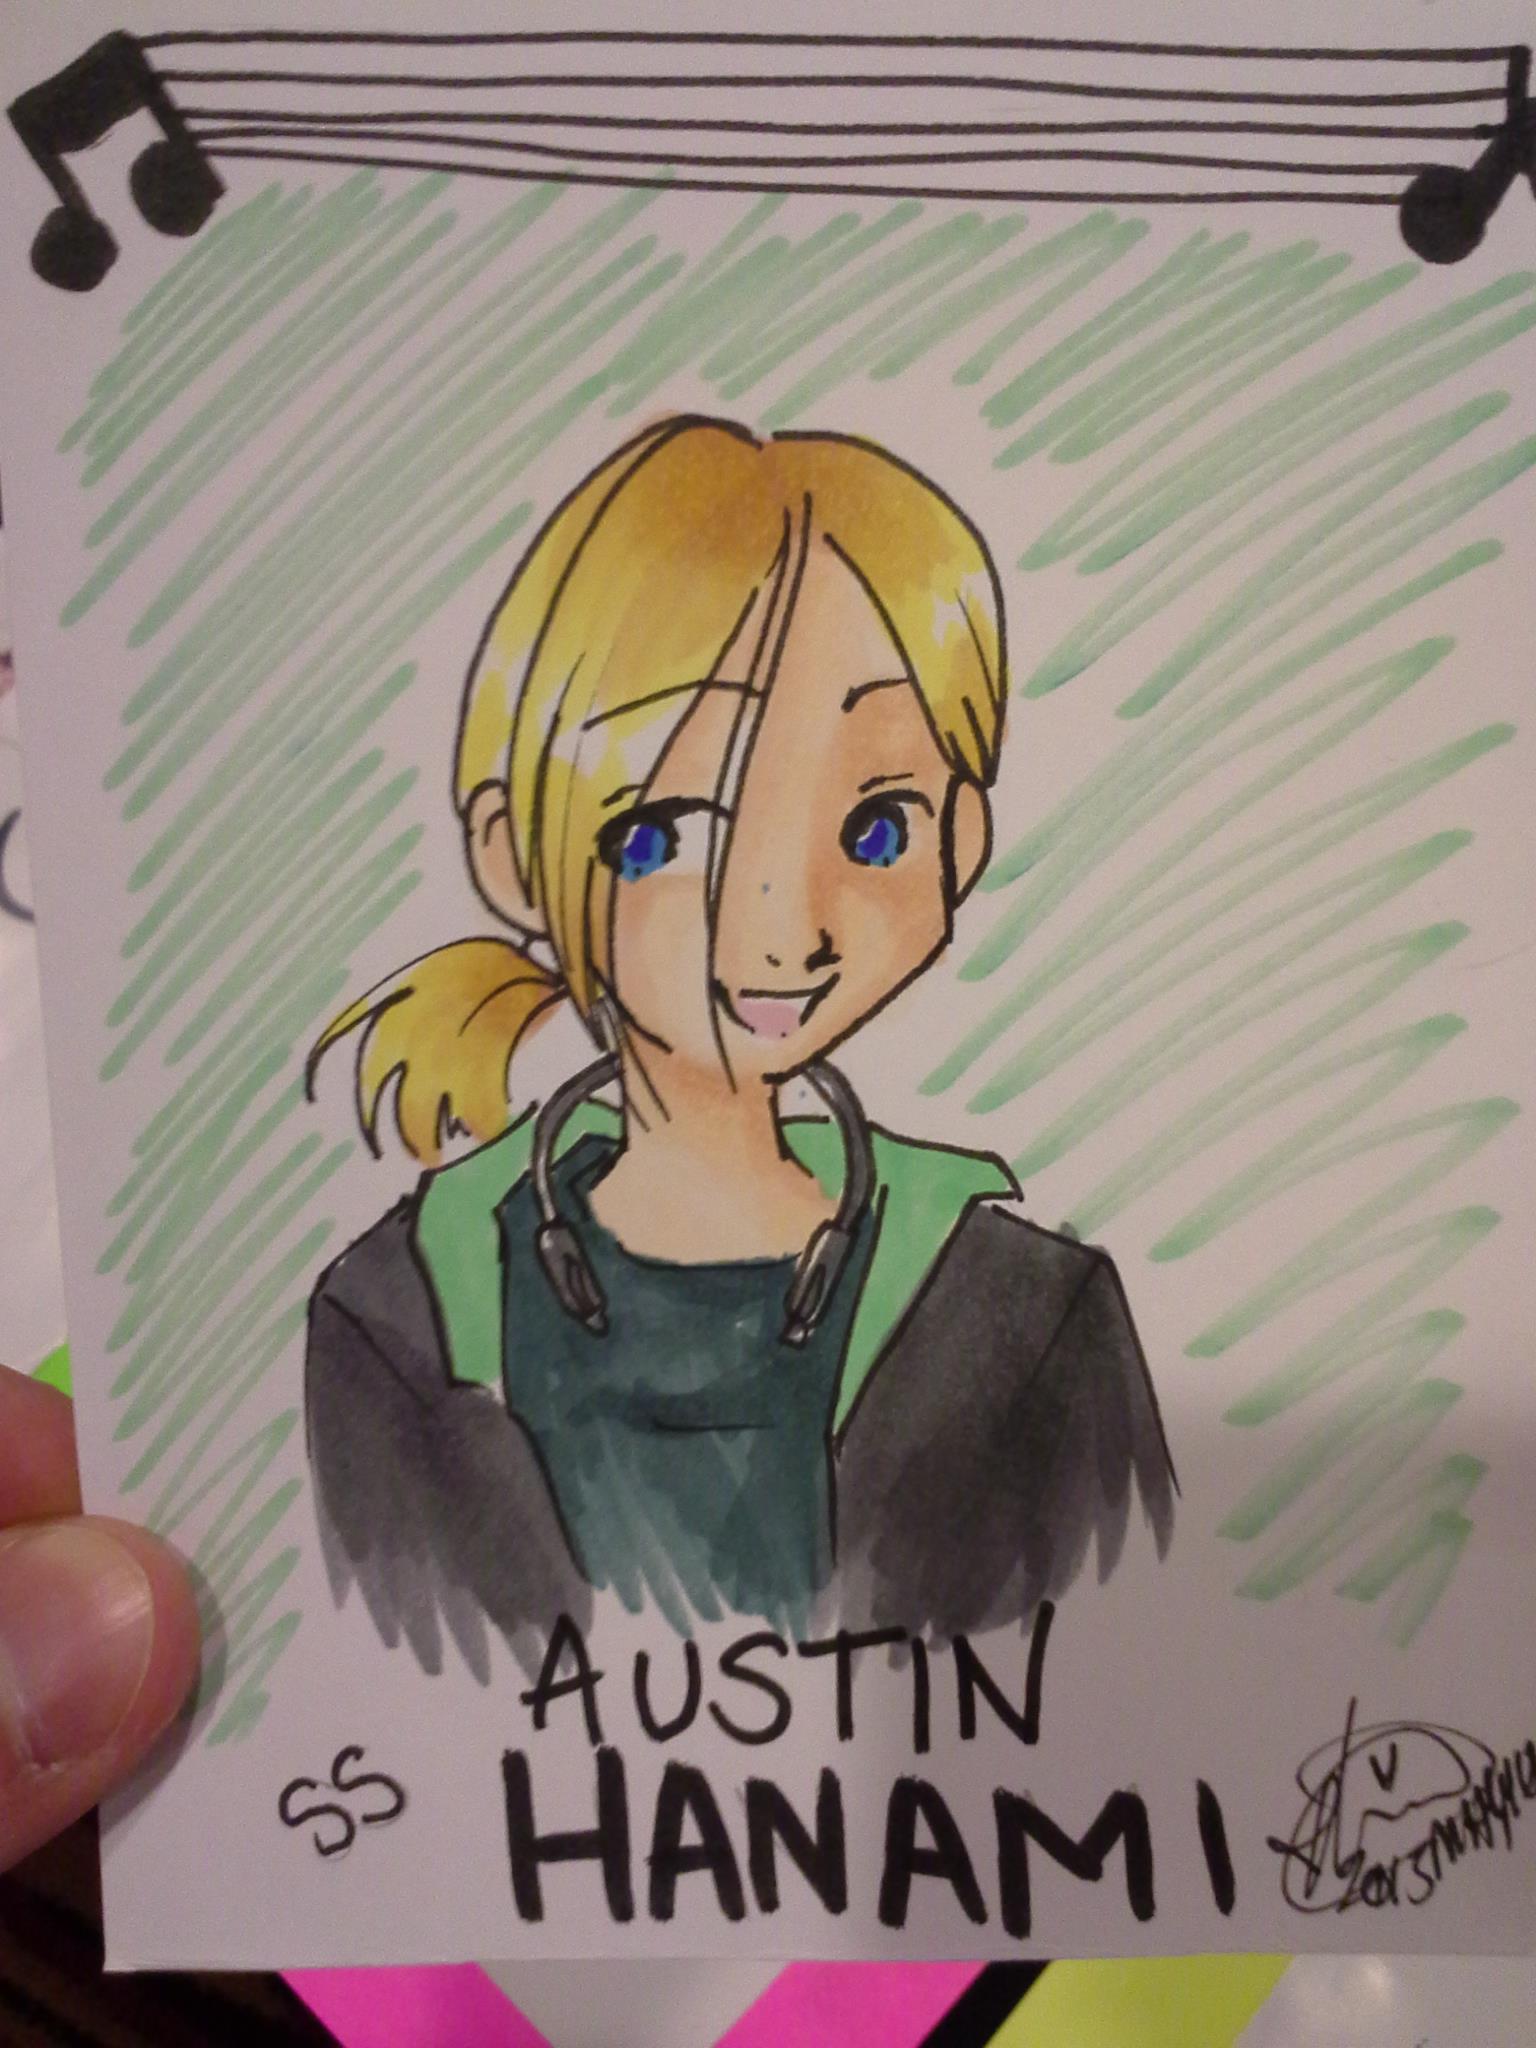 Beth [ hikaroo.deviantart.com ] drew custom badges for us at BelleCon, including our manager Austin